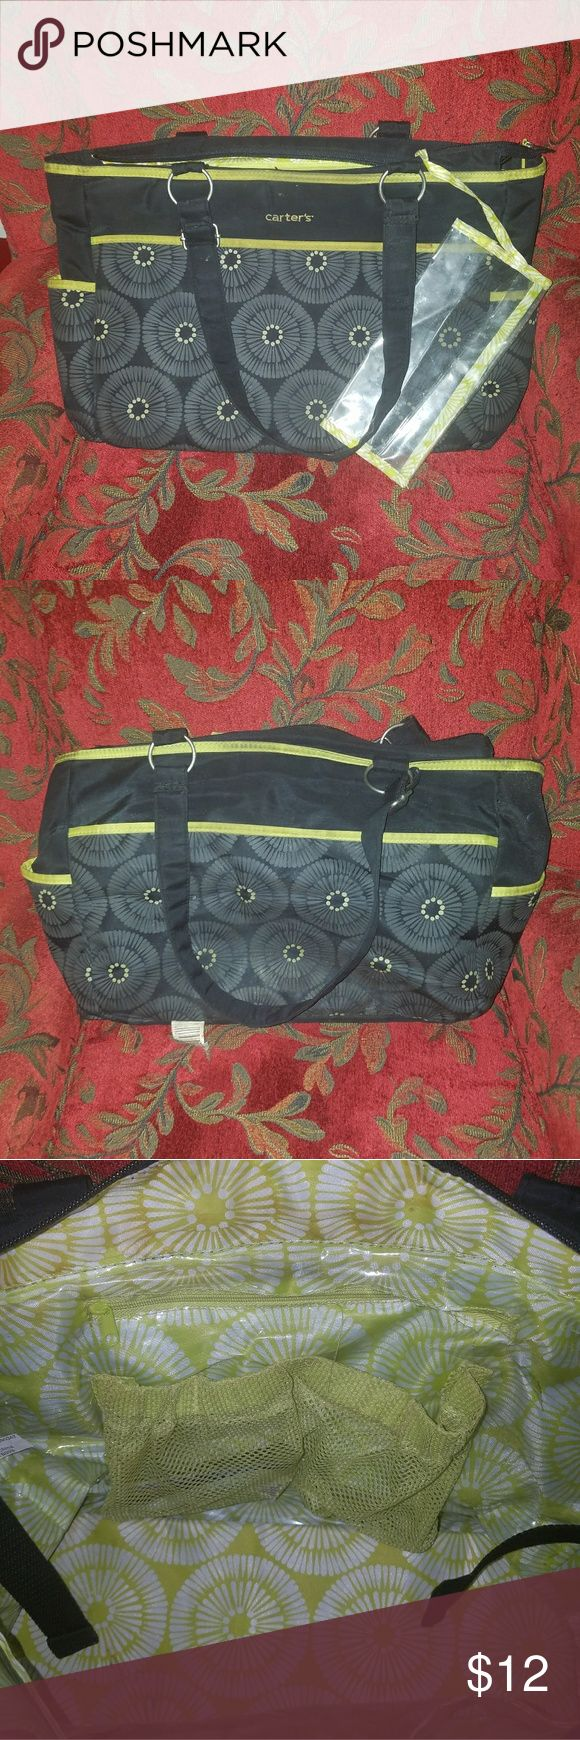 Carter baby Diaper Bag EUC Carter's Bags Baby Bags